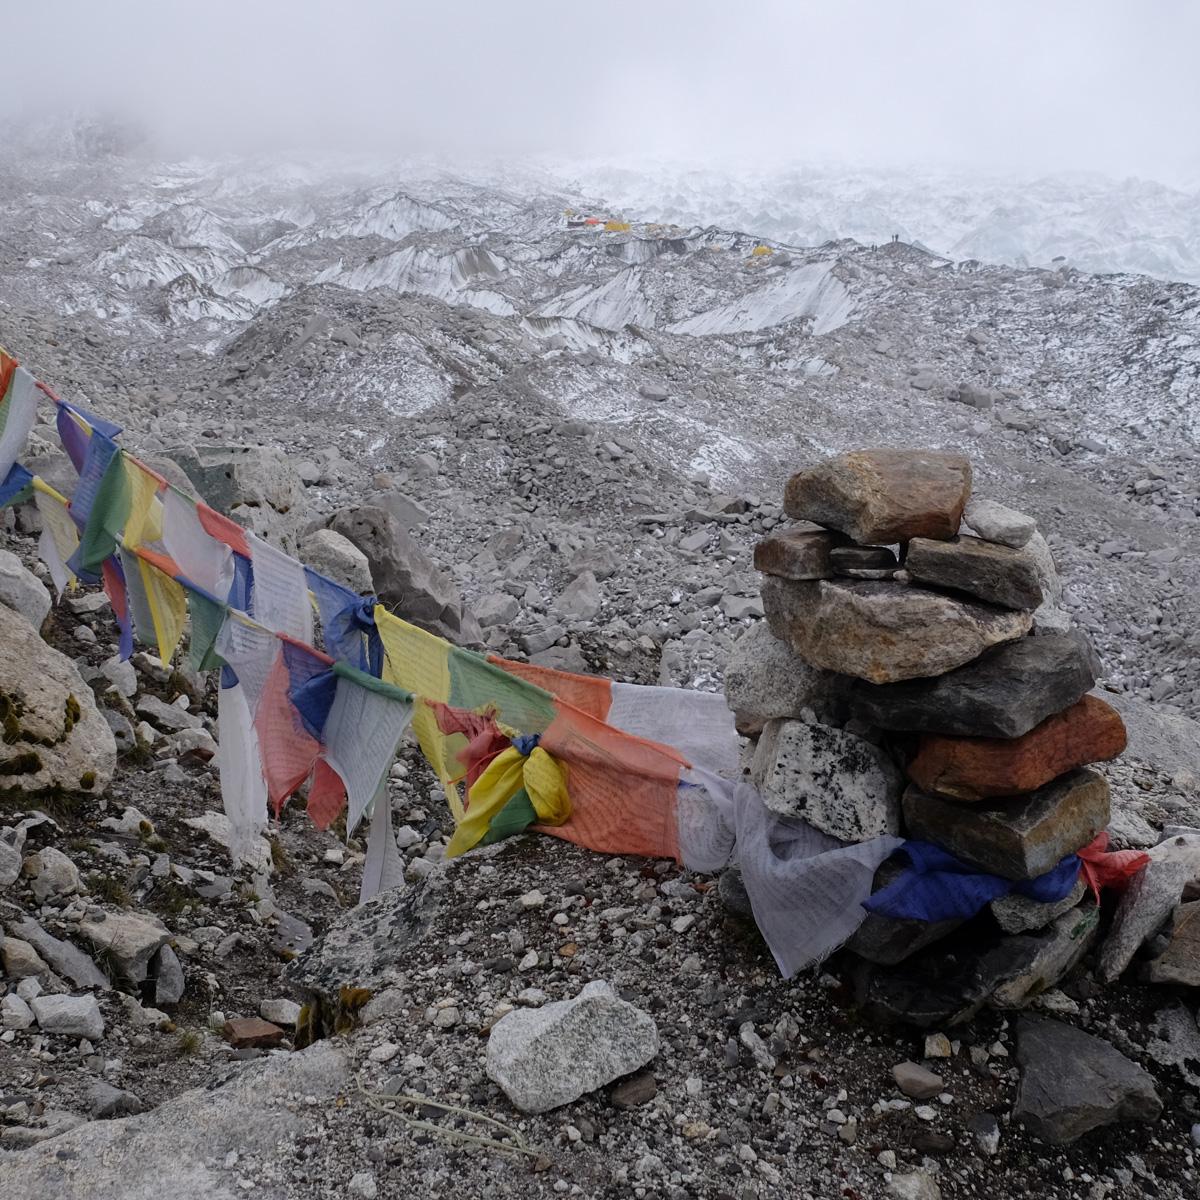 Everest Base Camp, Everest 3 pass #2 33